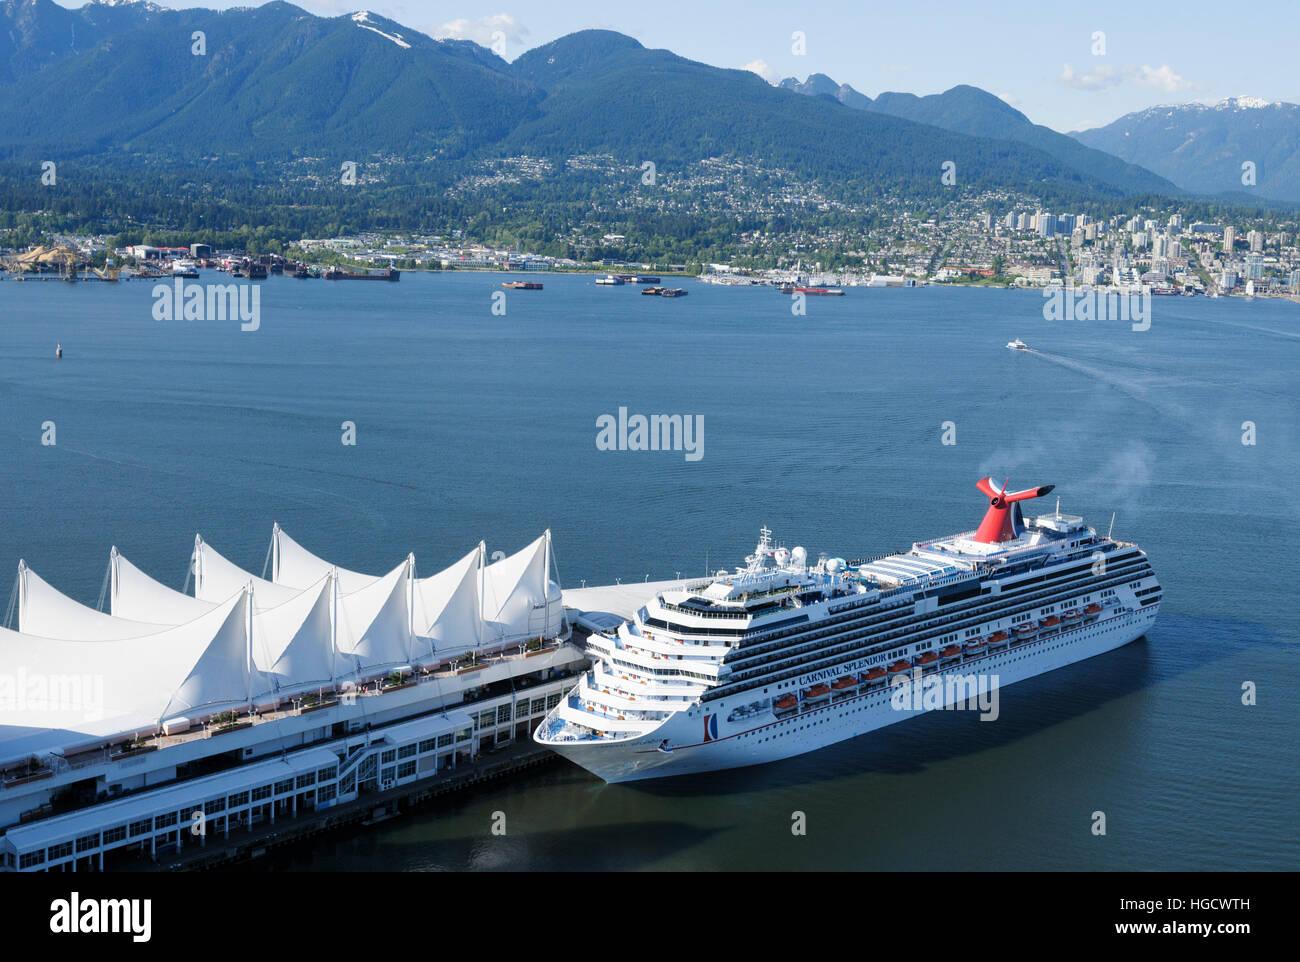 Carnival Splendor Cruise Ship Moored At Canada Place Cruise - Pictures of carnival splendor cruise ship